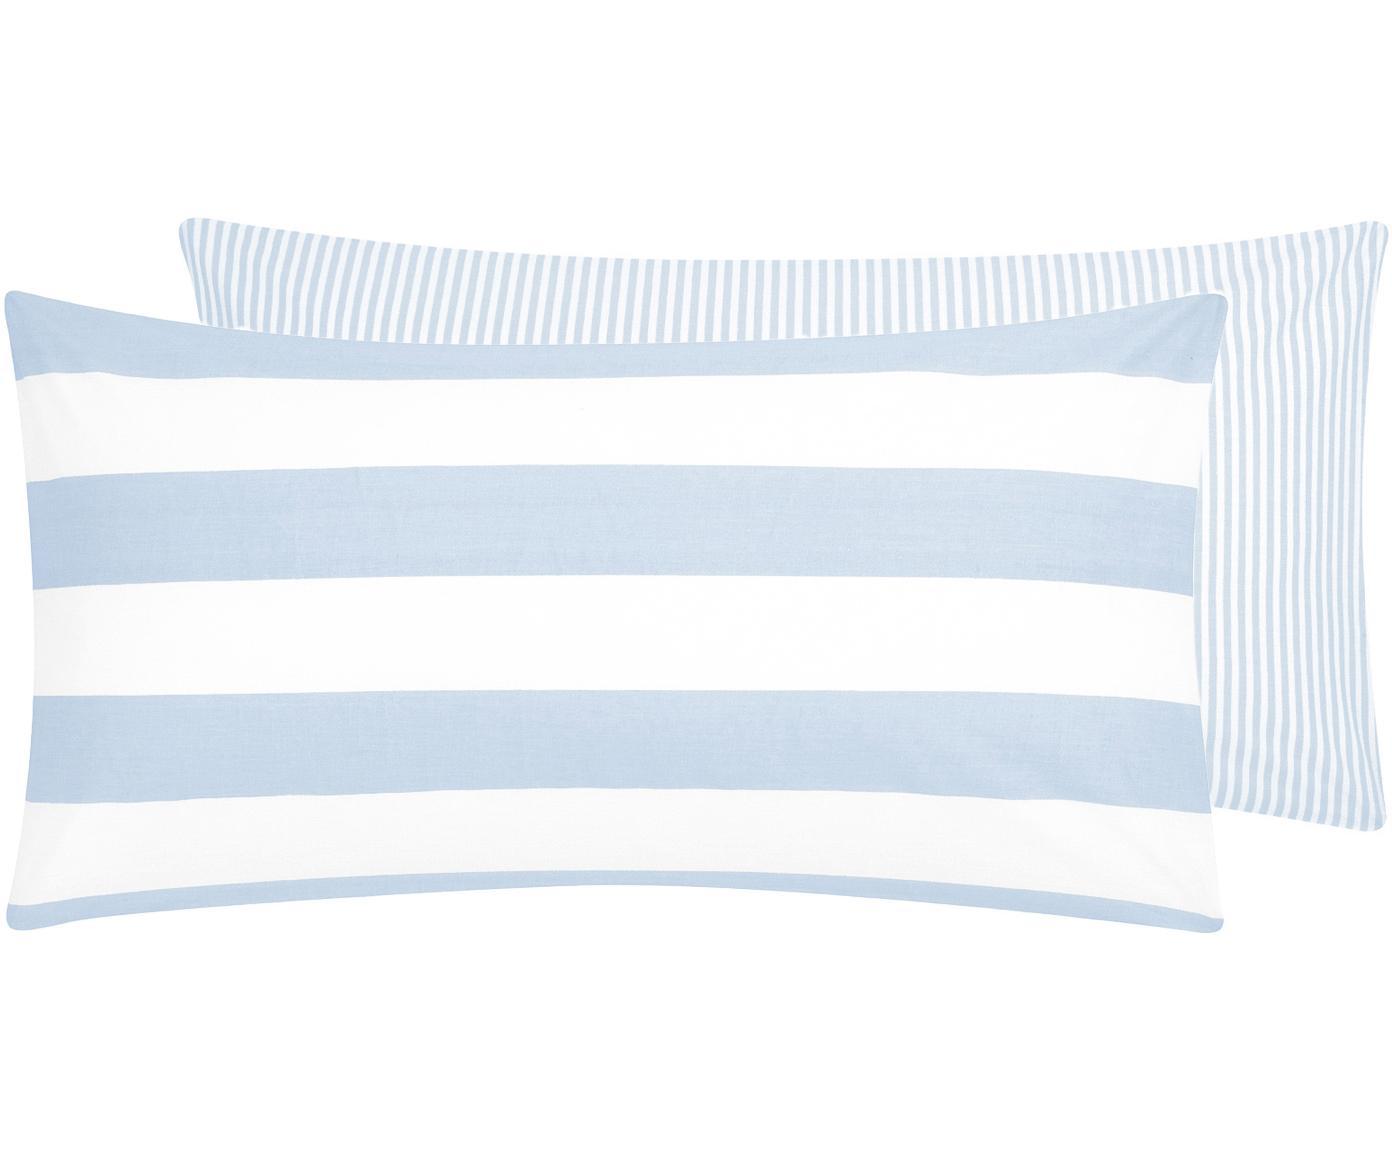 Funda de almohada de tejido renforcé Lorena, caras distintas, Azul claro, blanco crema, An 45 x L 85 cm